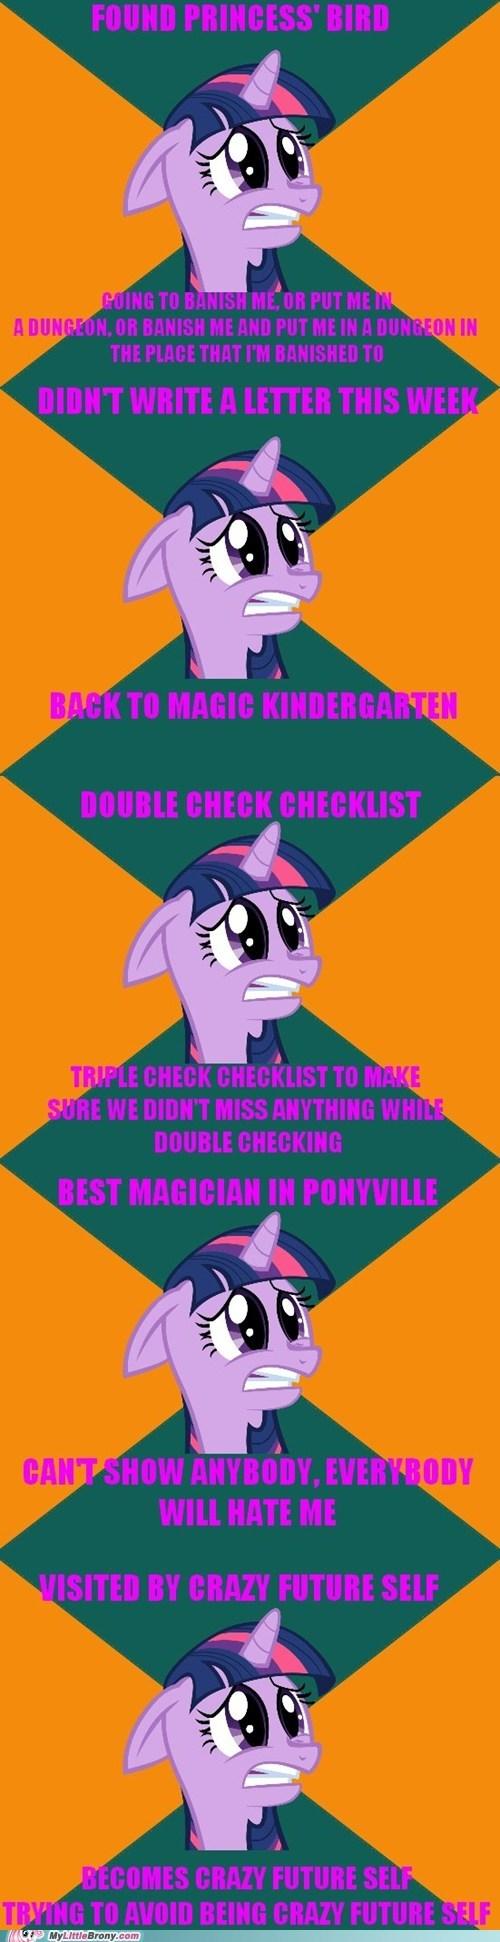 crossover meme paranoid pony twilight sparkle - 6355538176